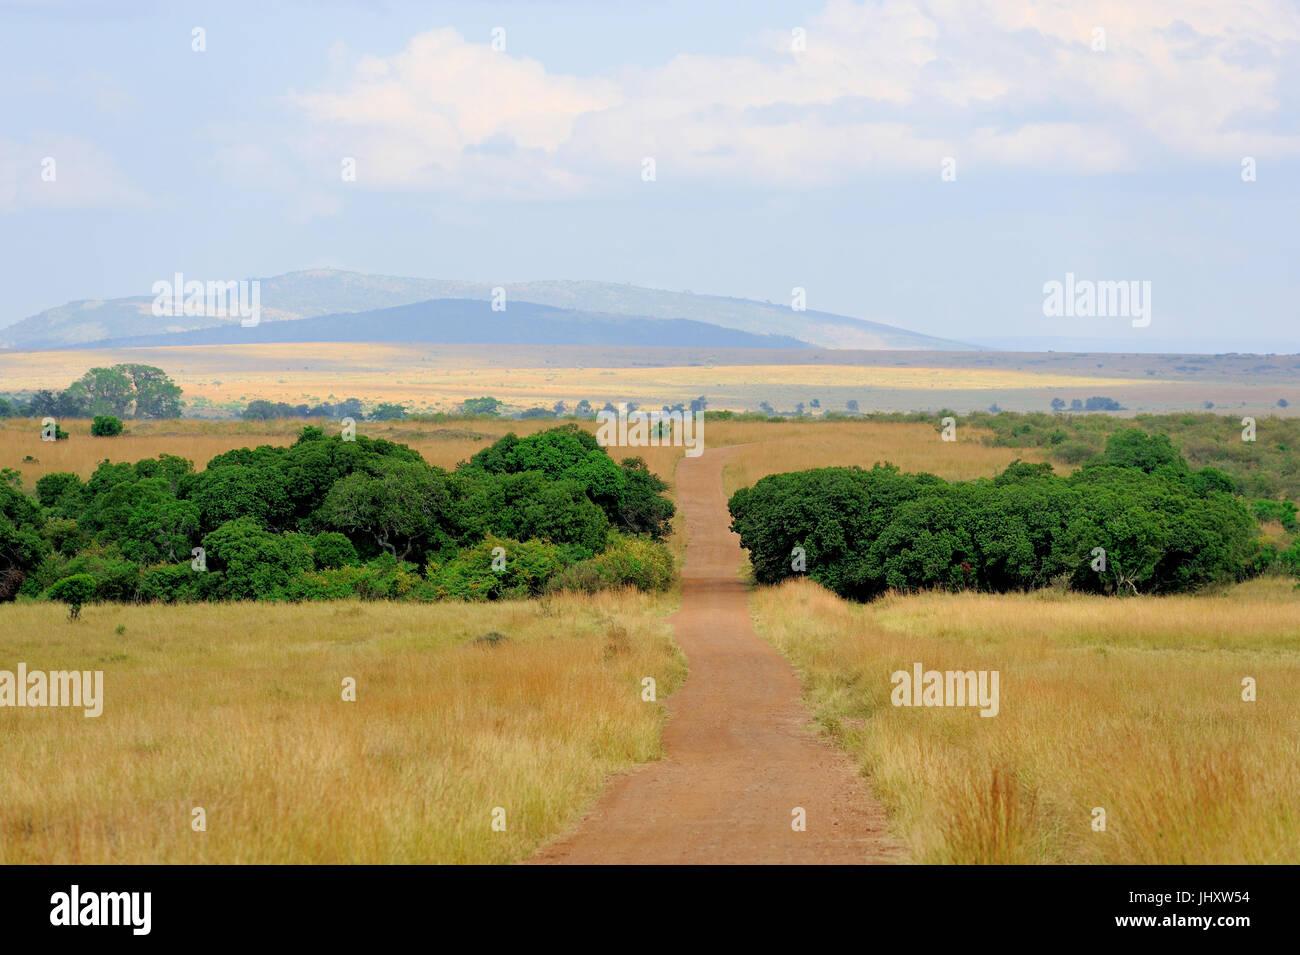 Paisaje de sabana en el parque nacional de Kenya, Africa. Imagen De Stock